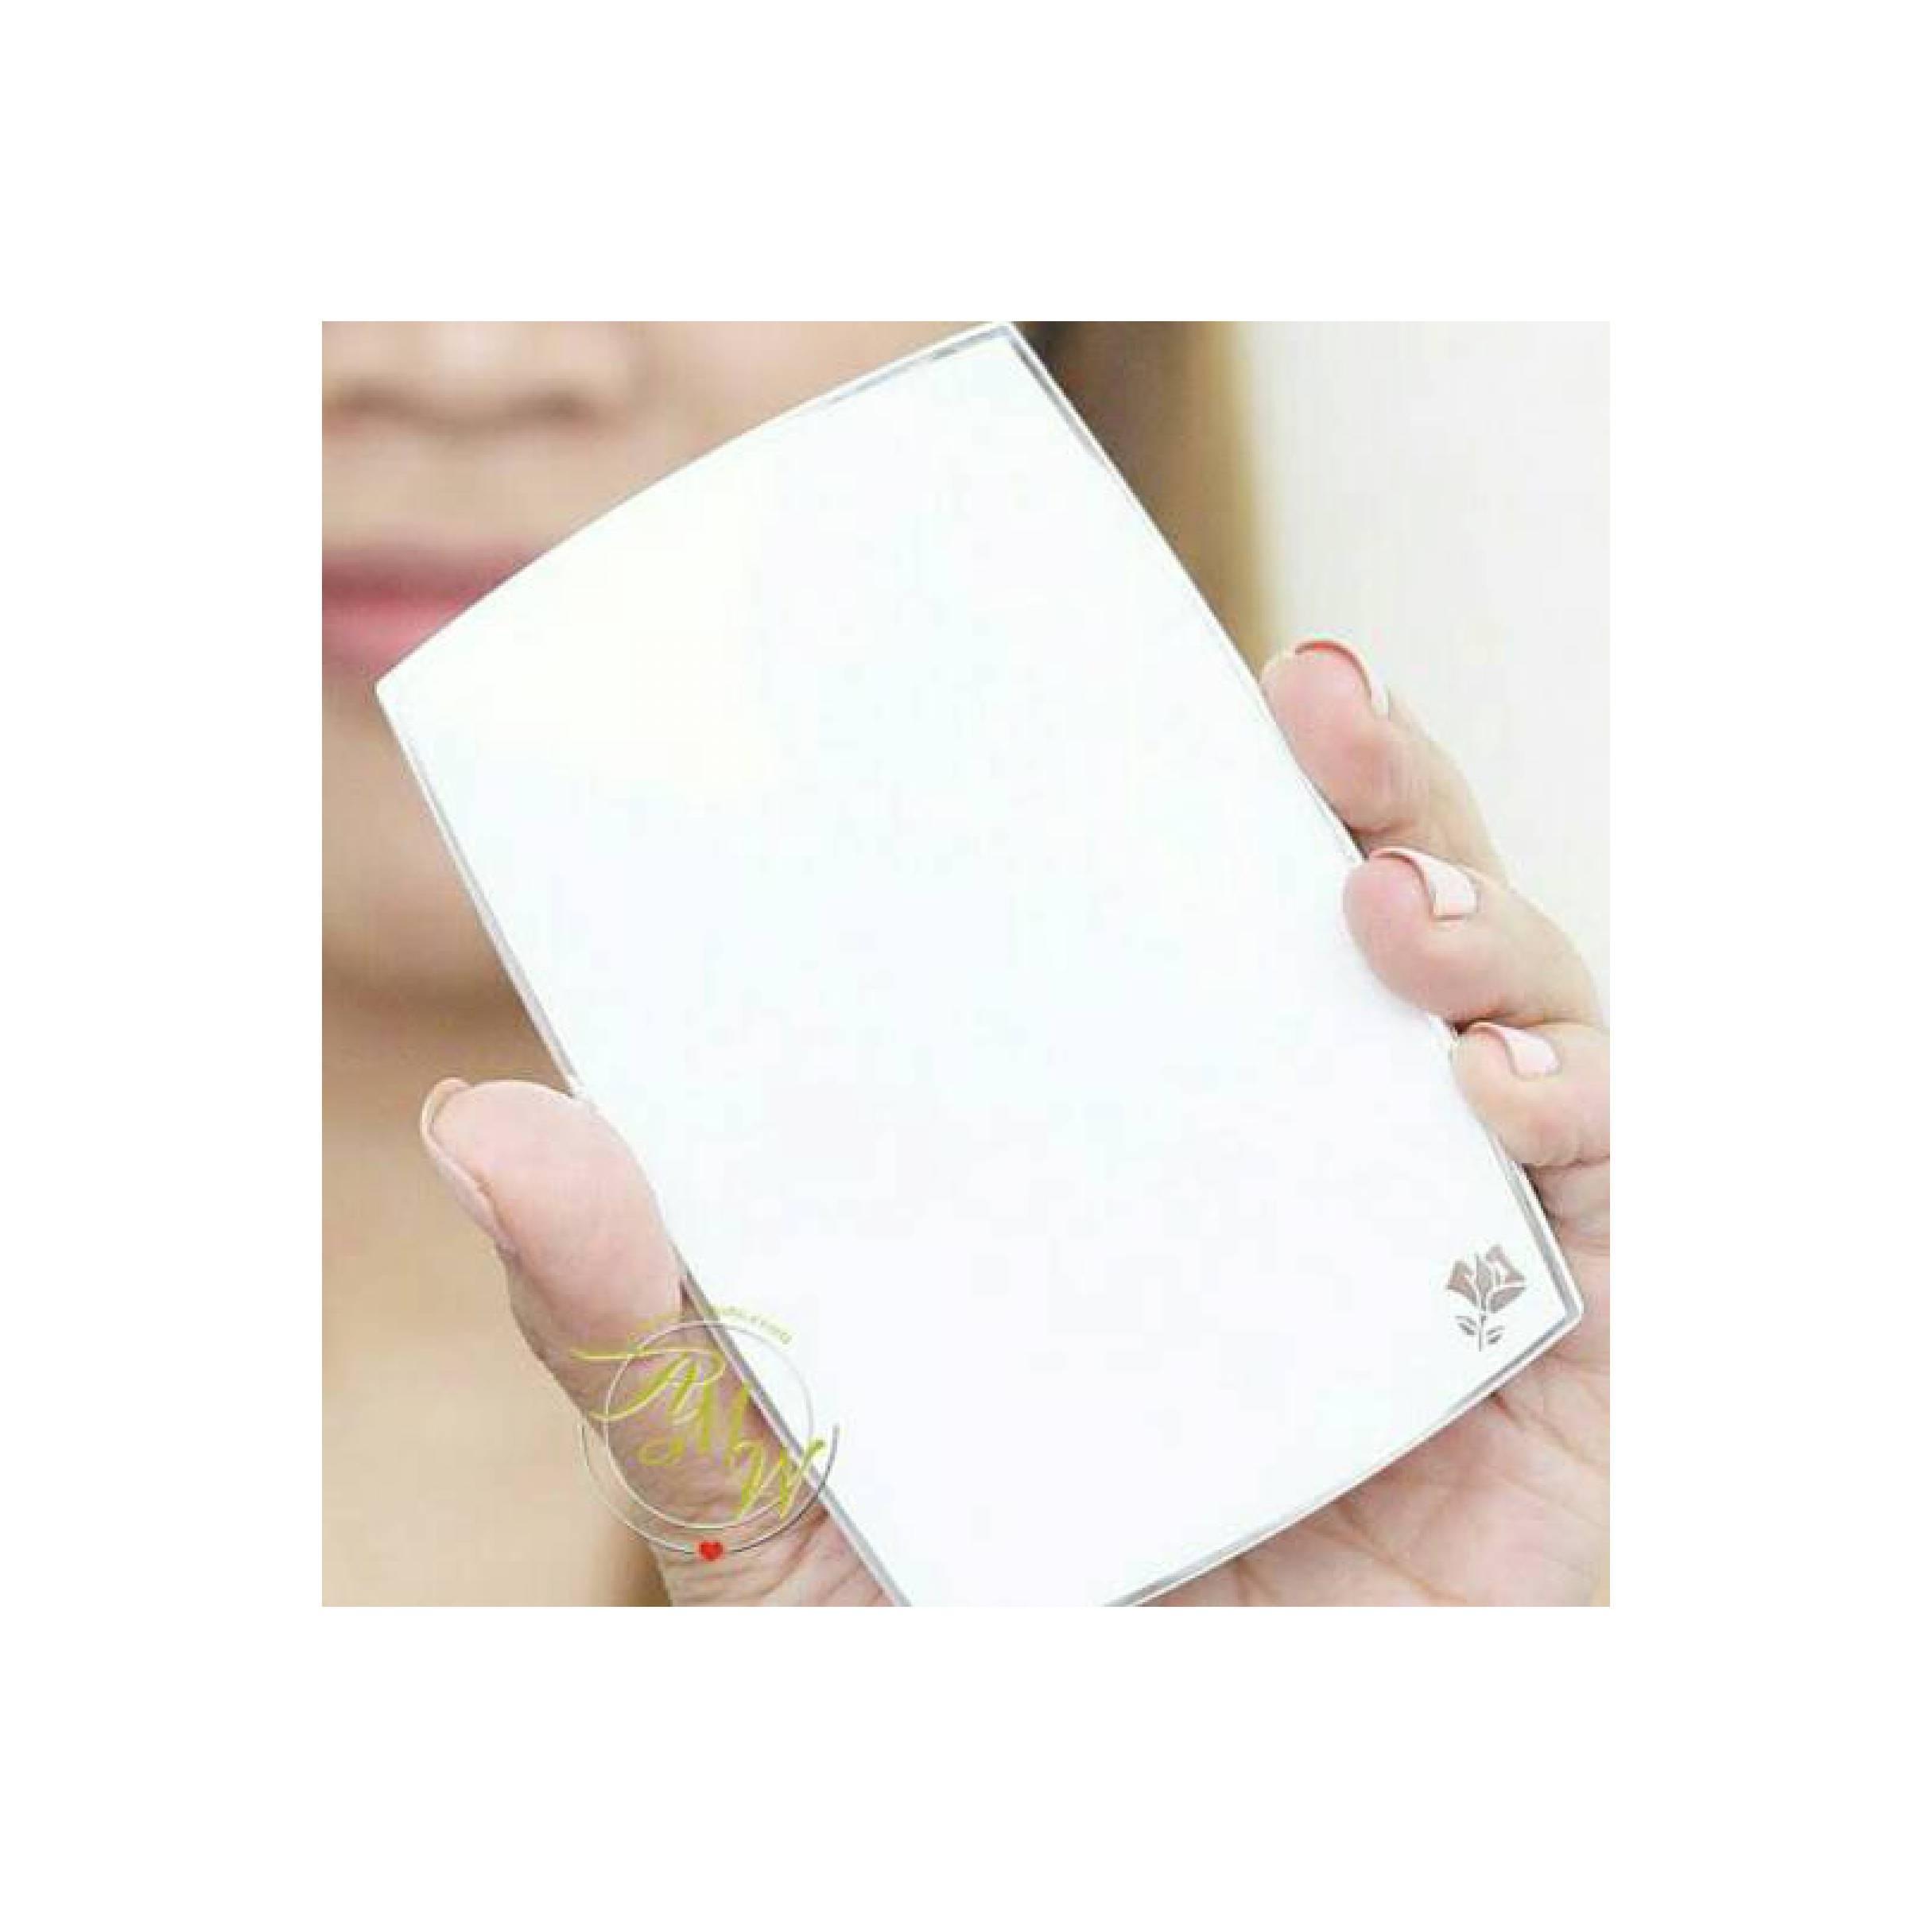 Lancome blanc expert compact powder foundation